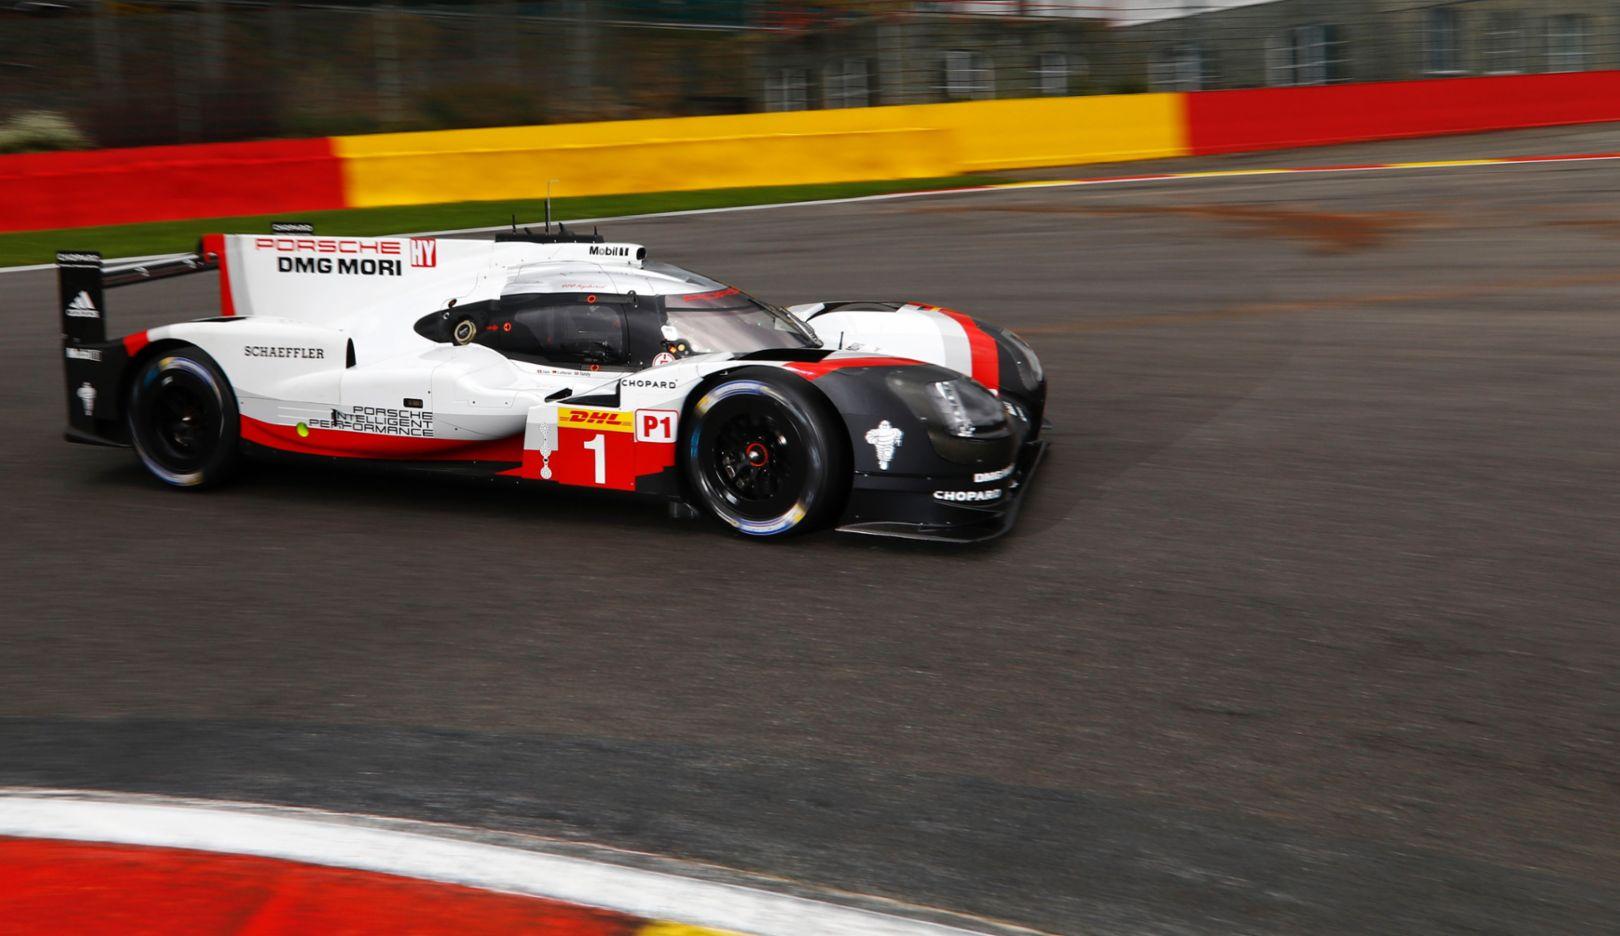 919 Hybrid, WEC, Free Practice, Spa-Francorchamps, Belgium, 2017, Porsche AG